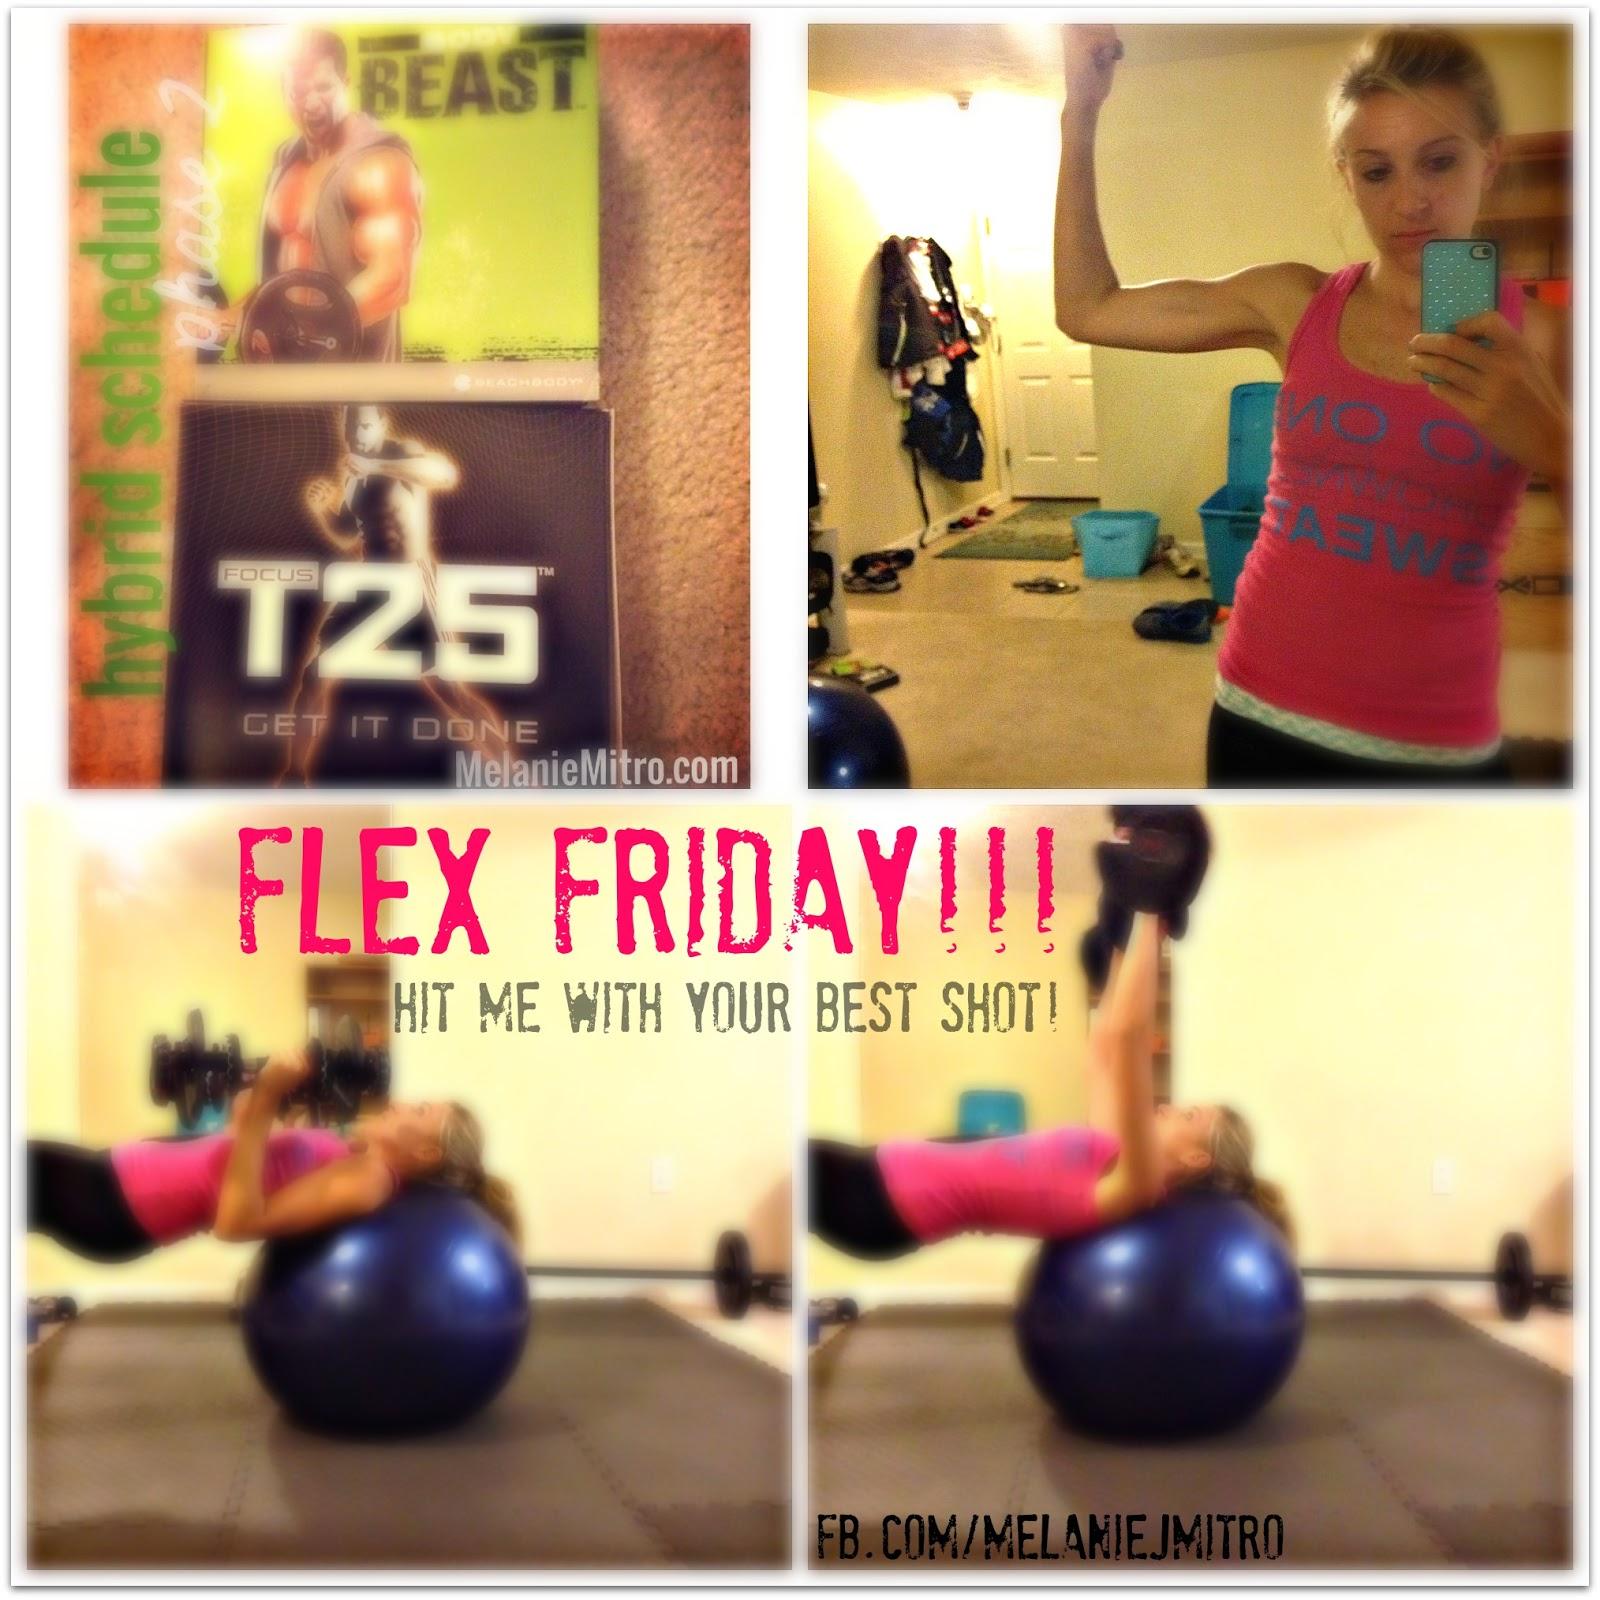 Week 5 Body Beast T25 Progress Update | Melanie Mitro